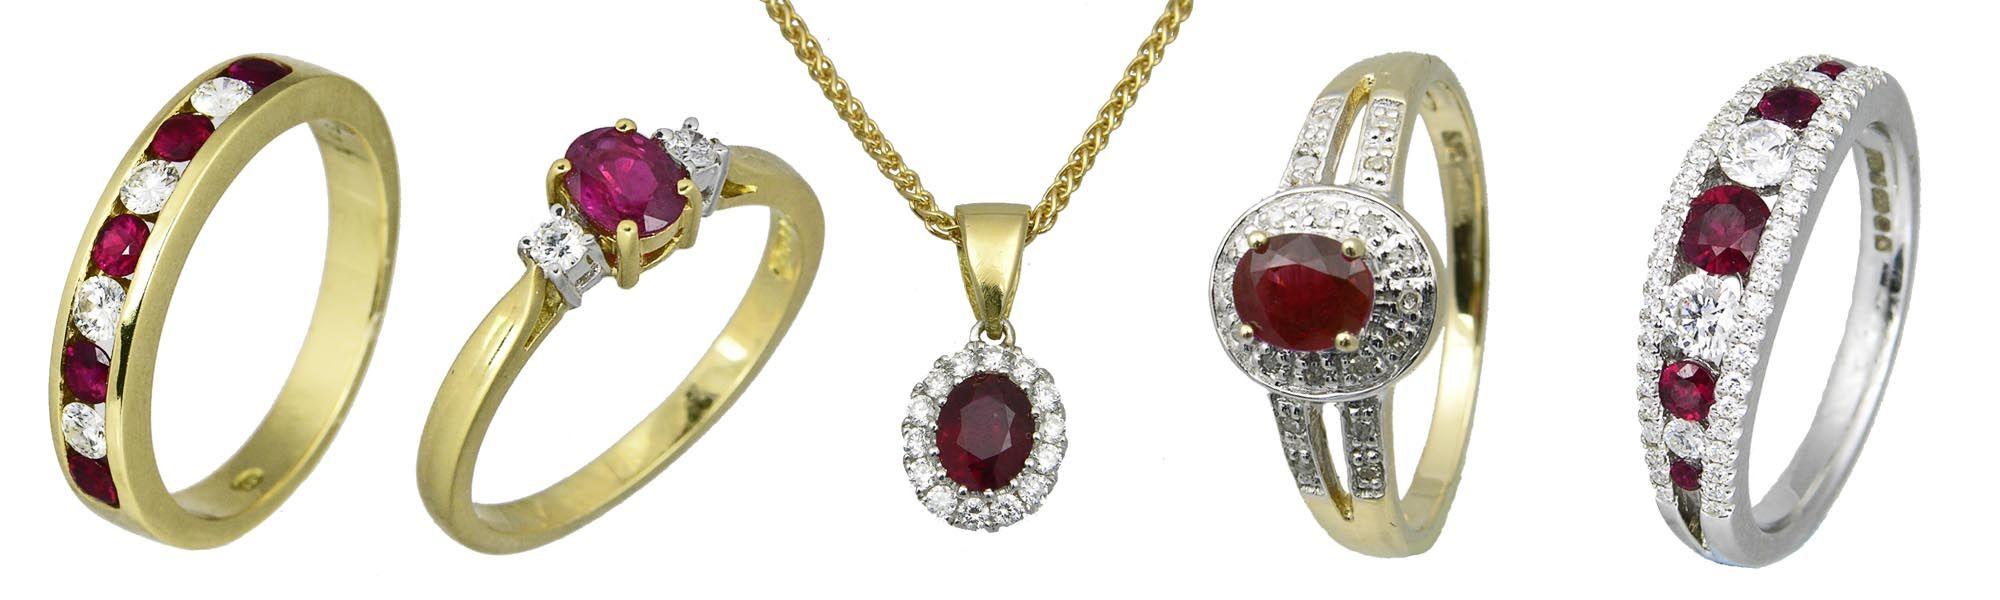 Sally Thornton Jewellery Blog on Ruby from Thorntons Jewellers Kettering Northampton